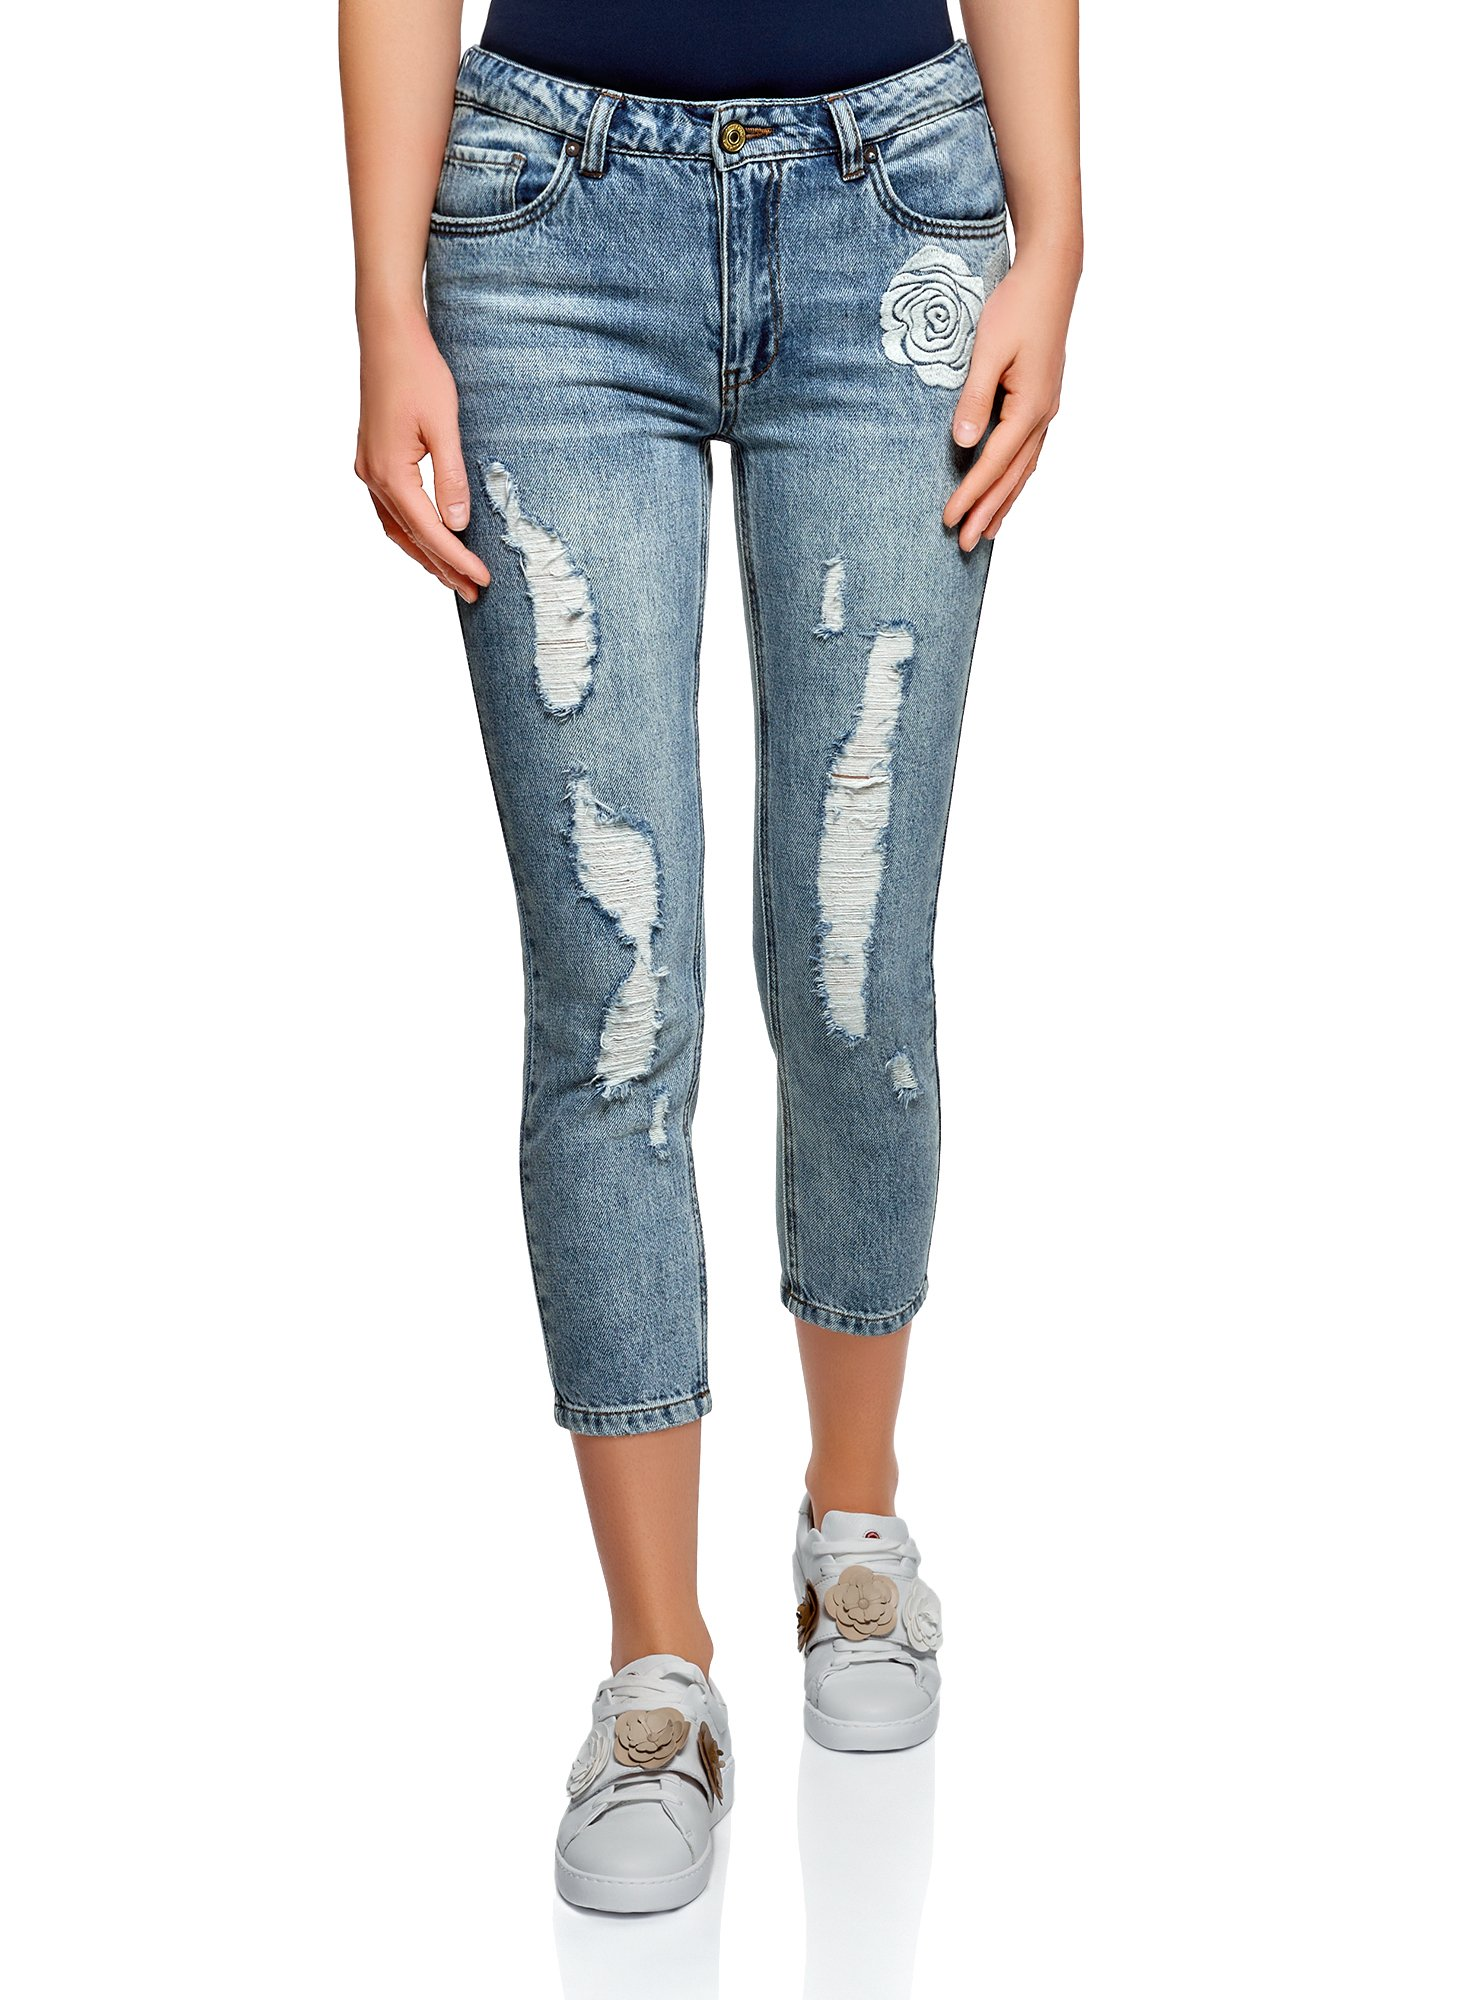 oodji Ultra Women's Embroidered Boyfriend Jeans, Blue, 29W / 32L (US 8 / EU 42 / L)